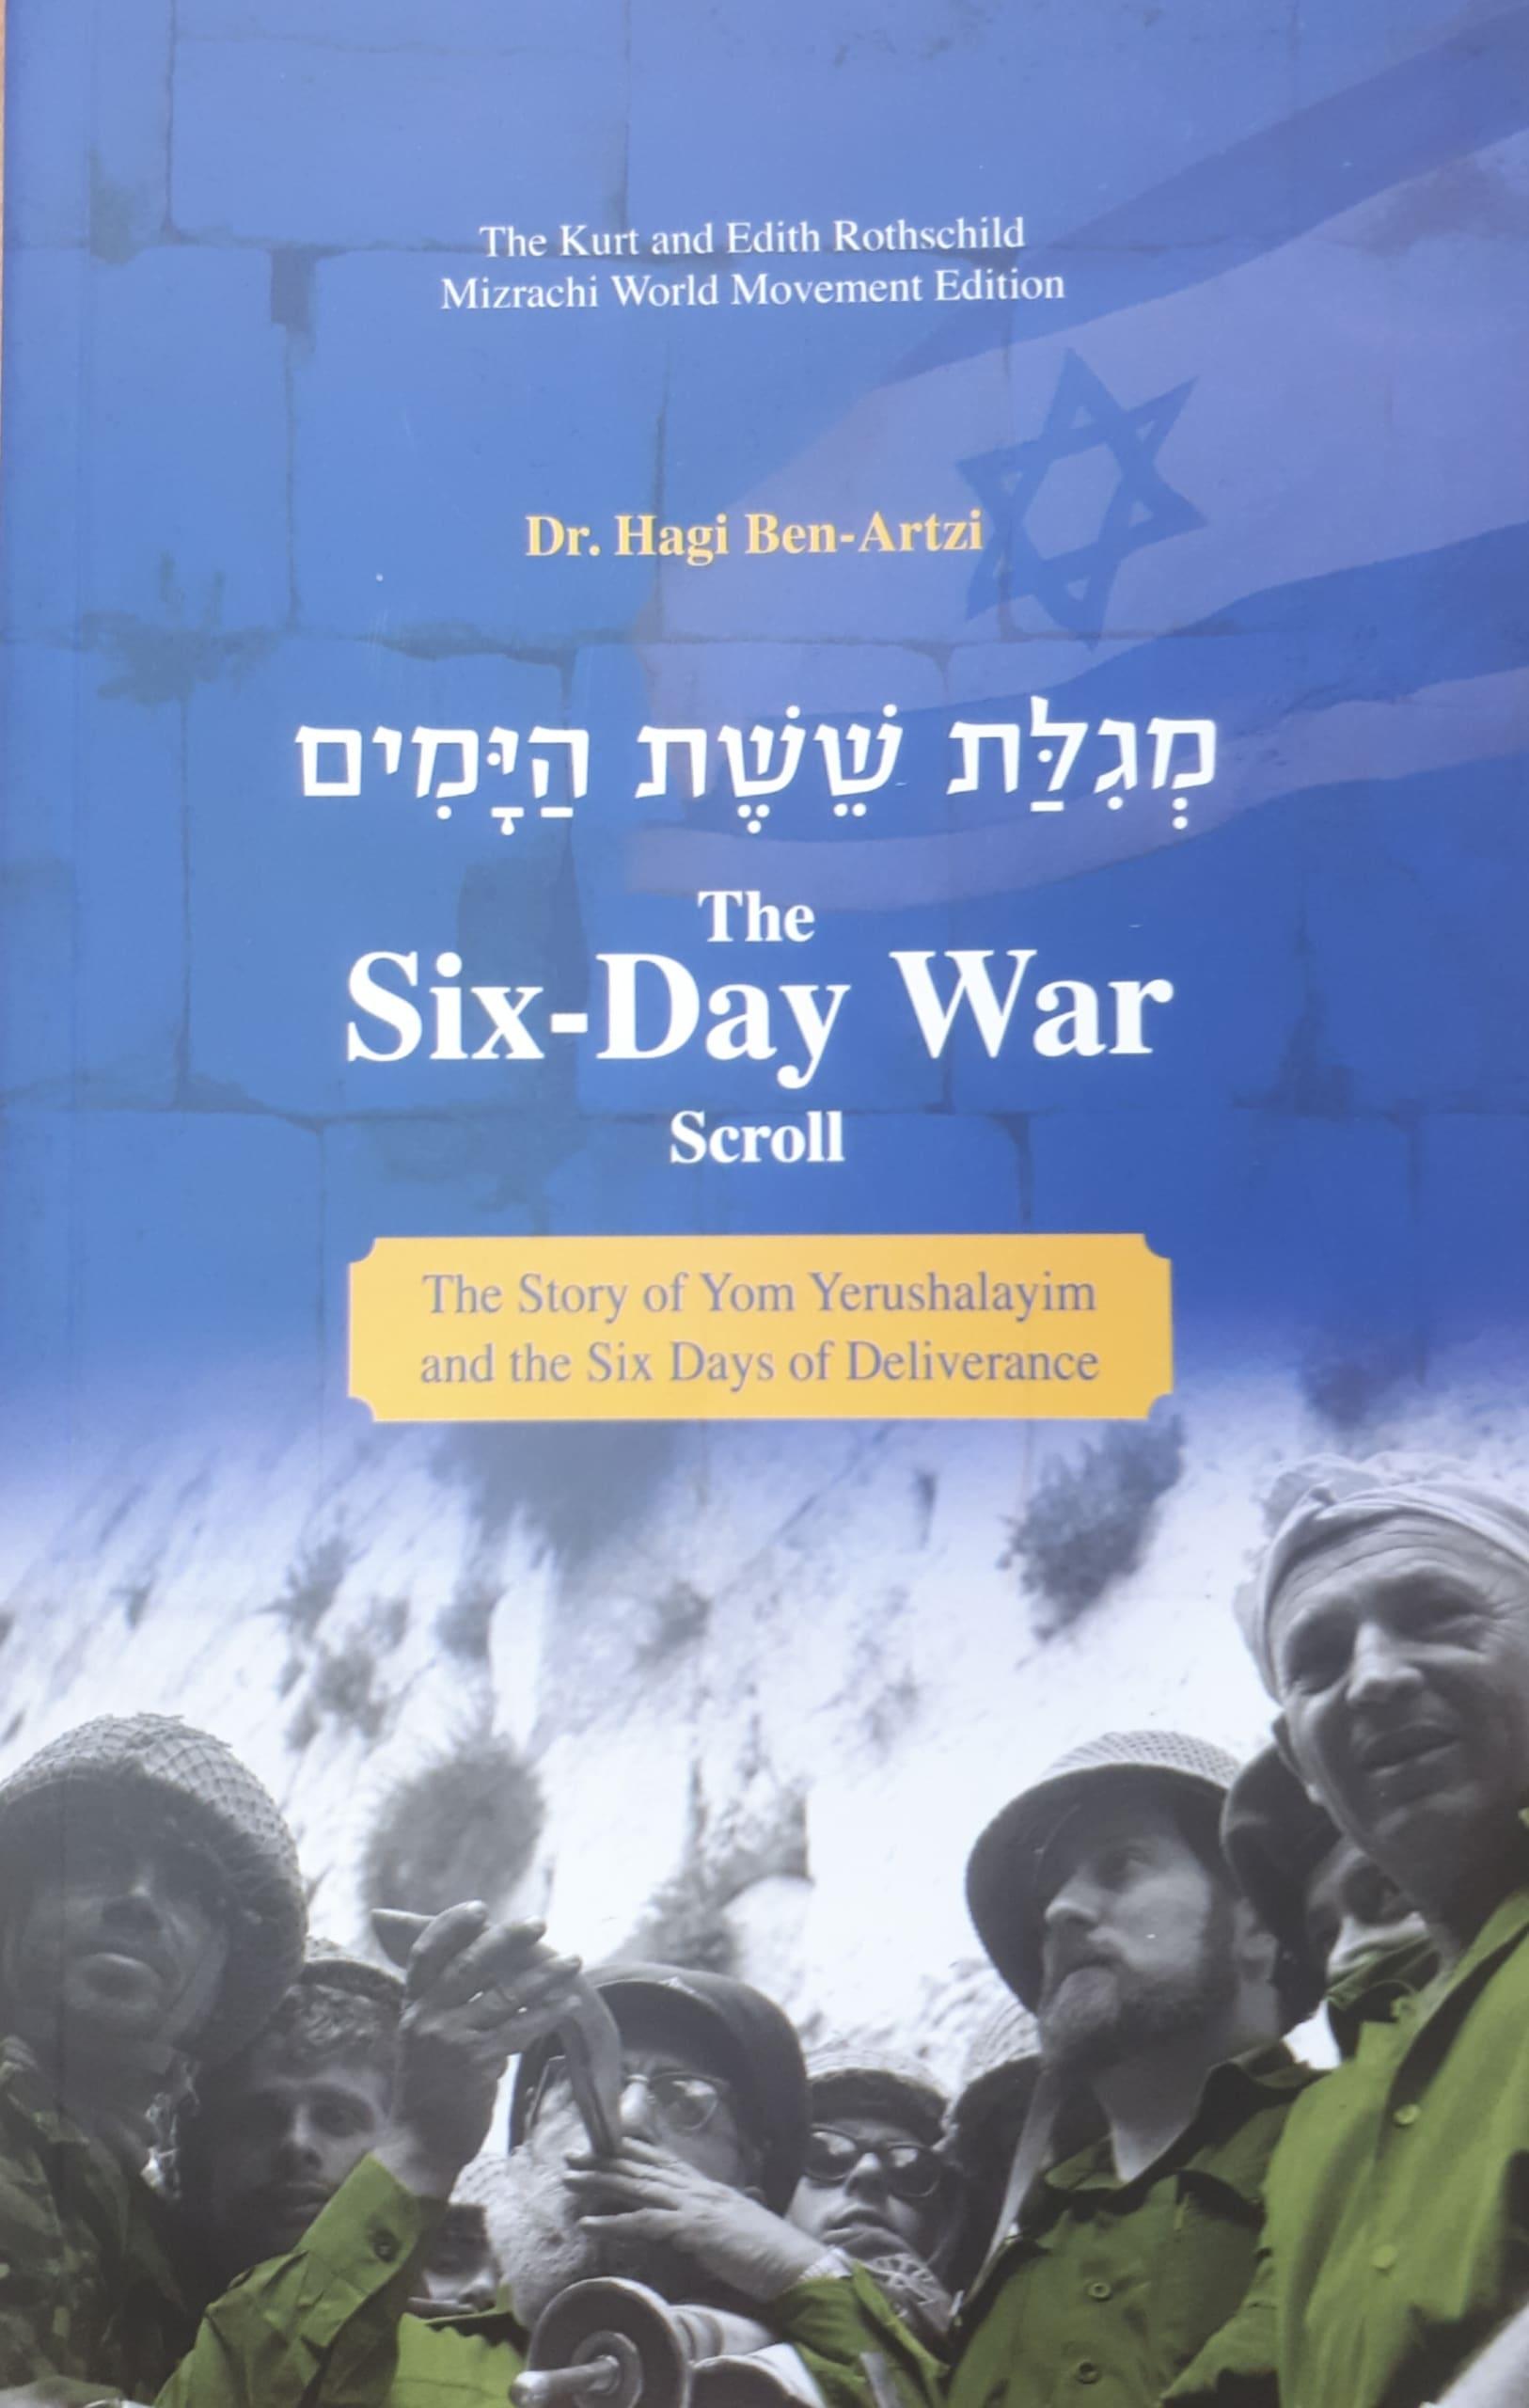 The Six-Day War Scroll